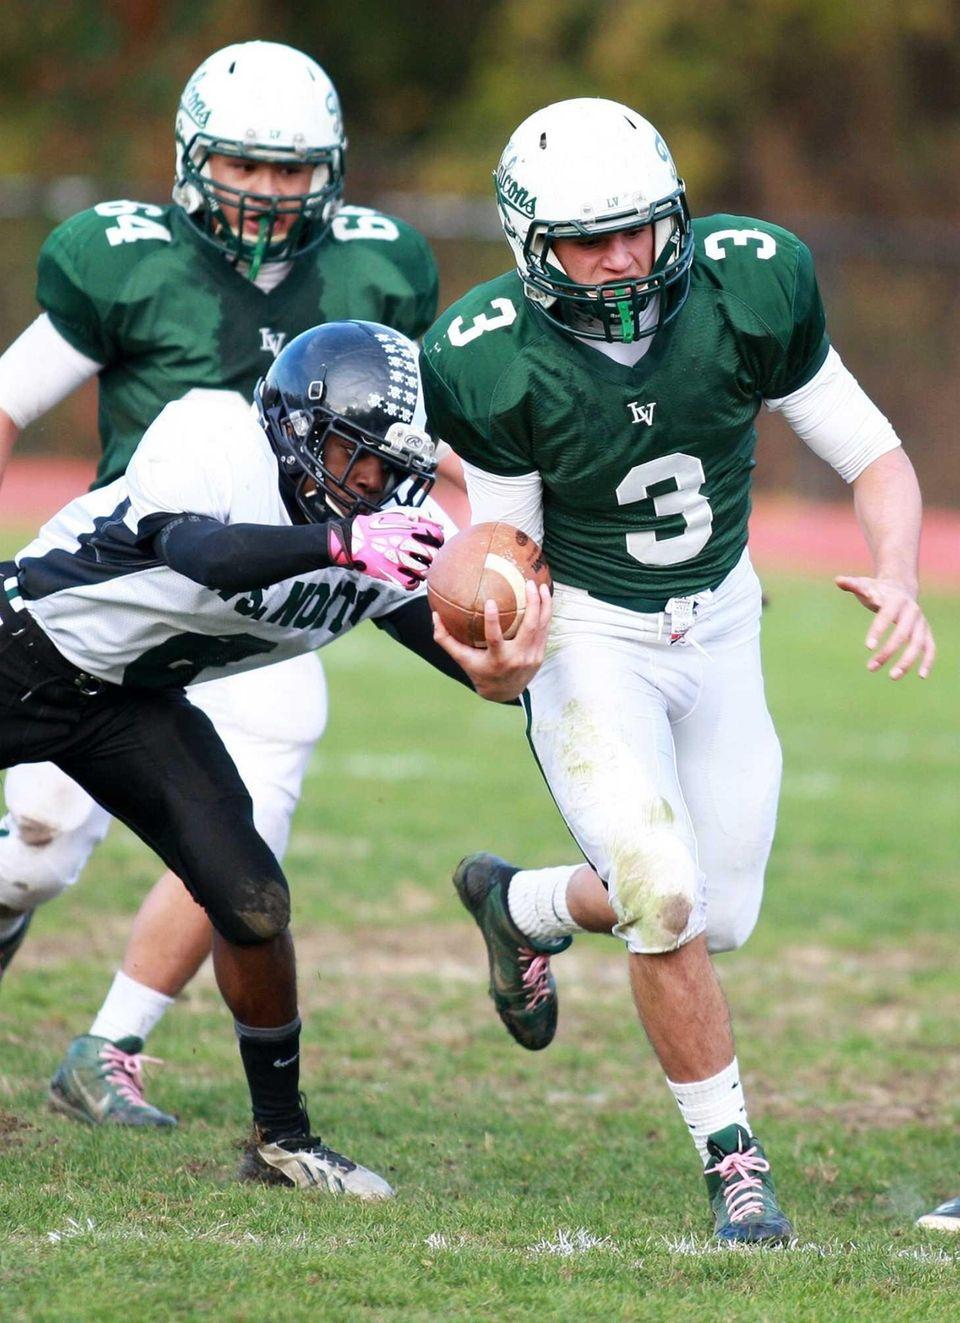 Locust Valley quarterback Jordan Formicola (no. 3) tries